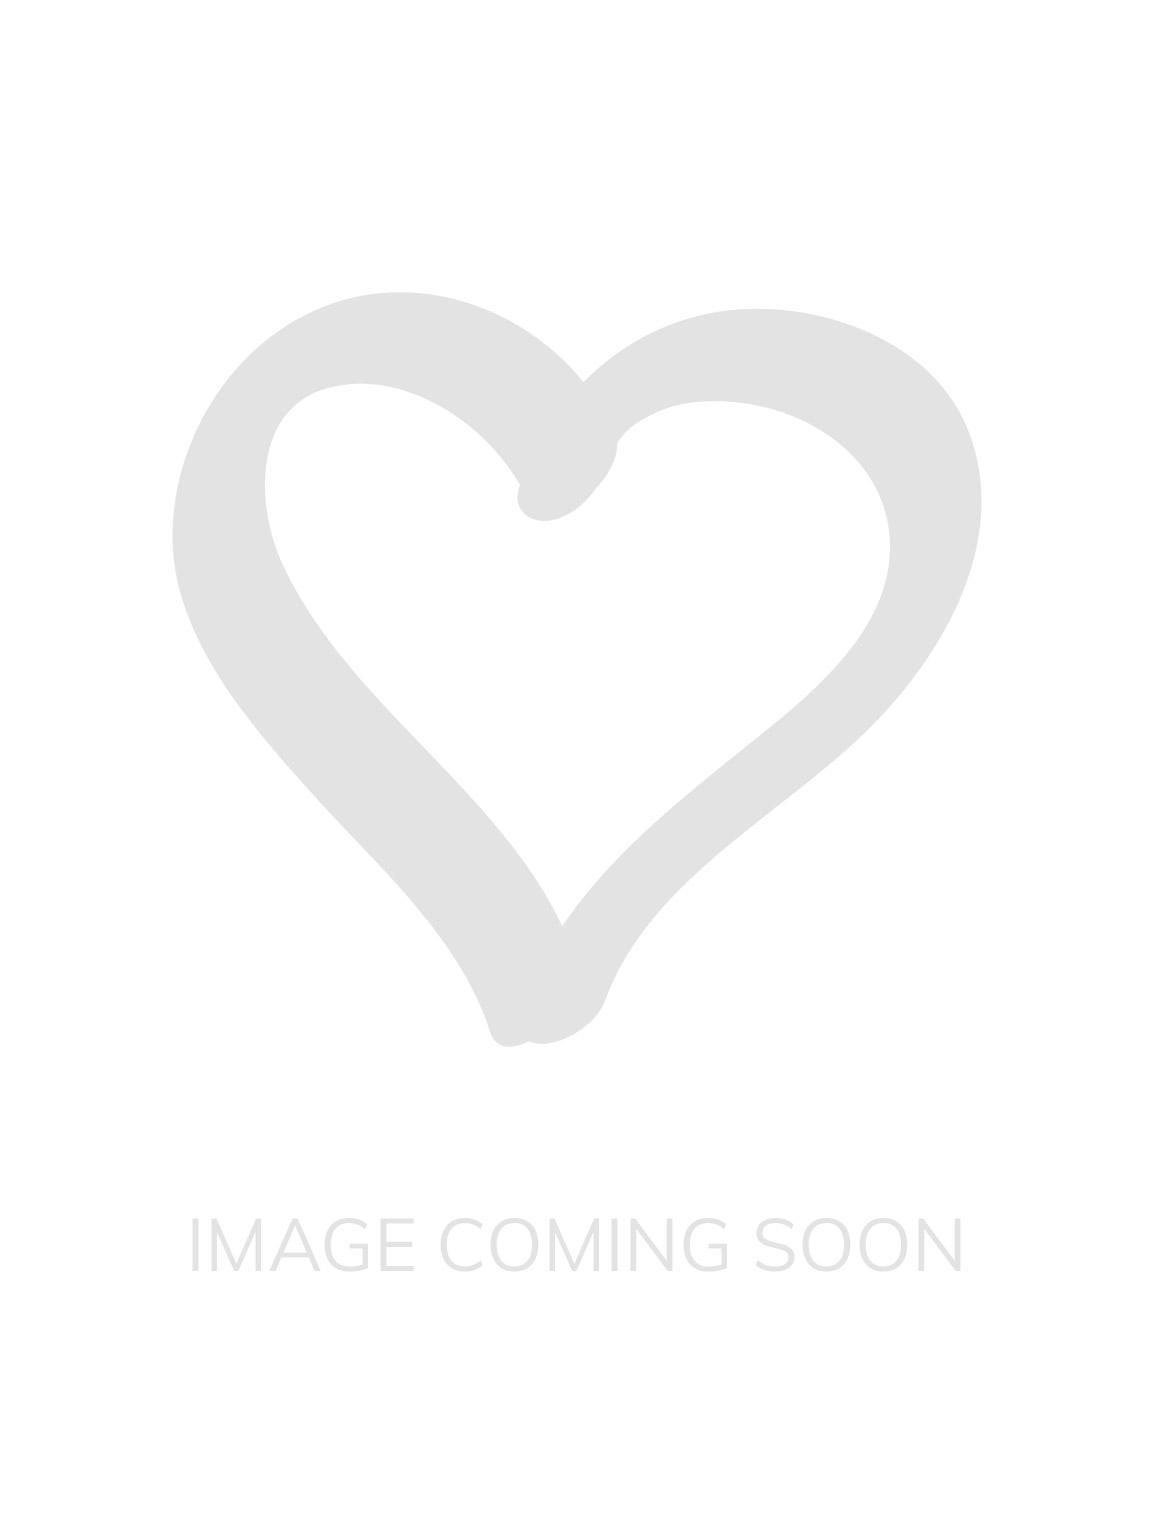 c7ff74503f Lotus Full Cup Bra - Venus